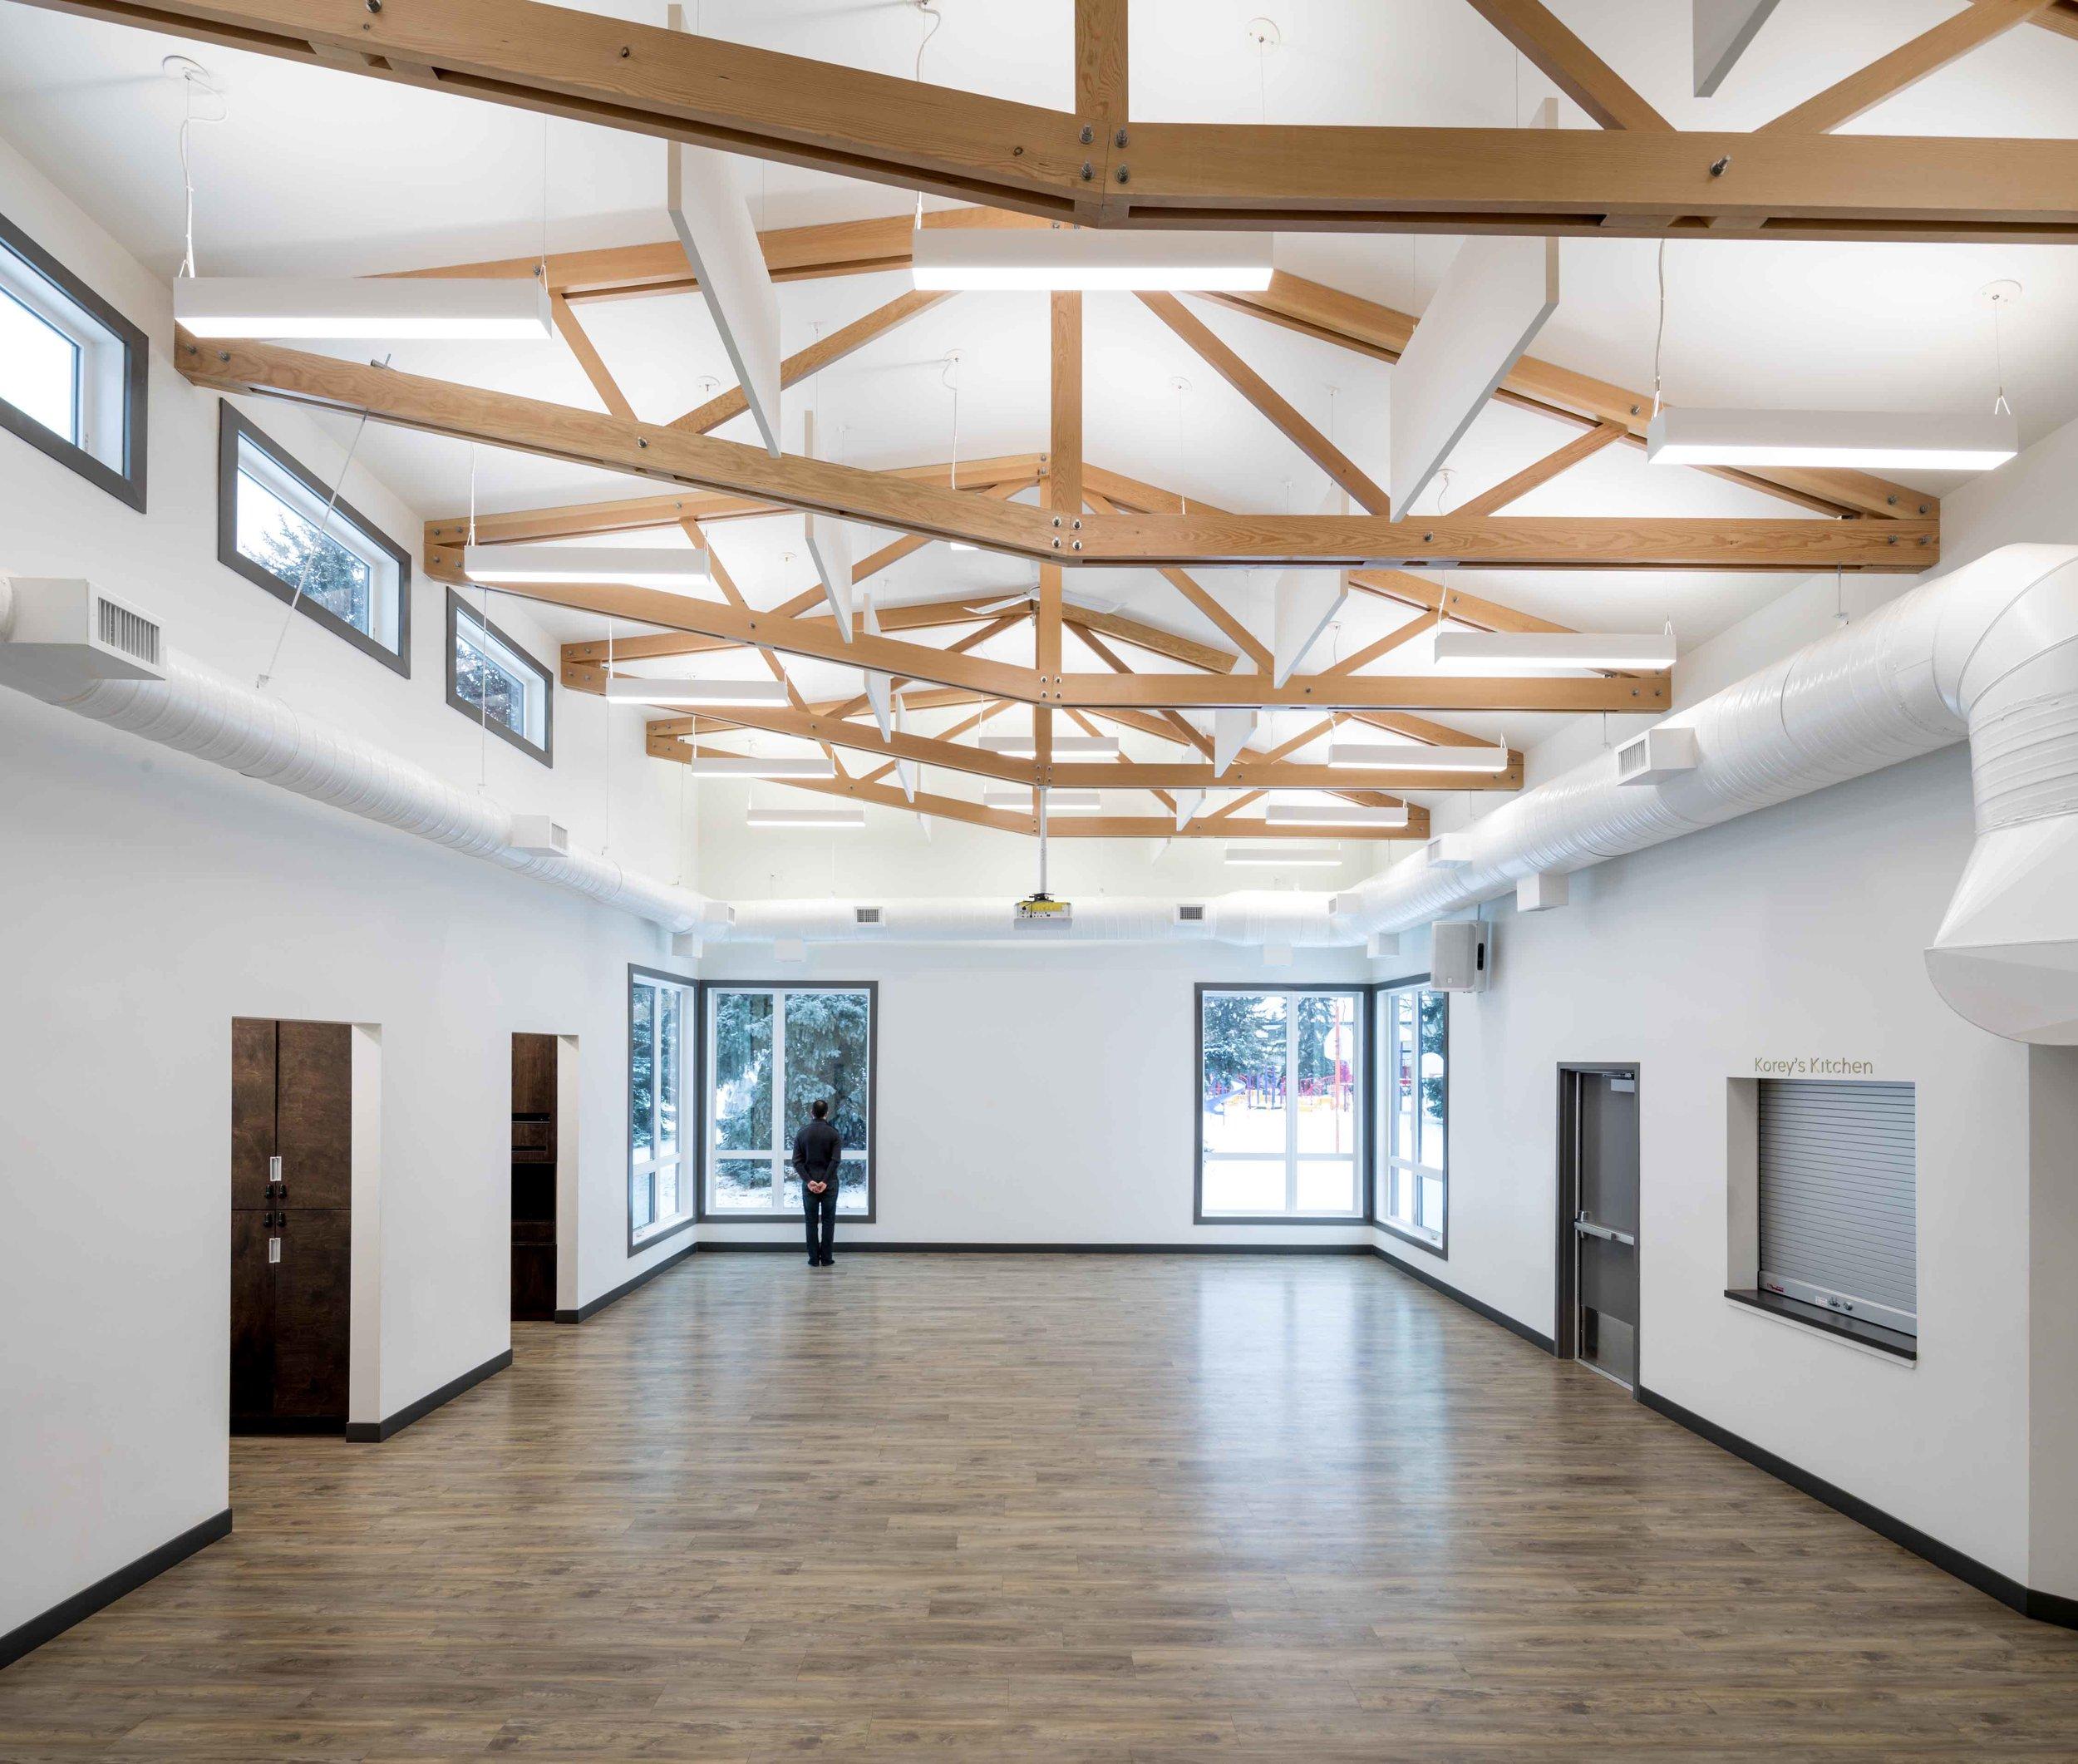 Strathern Community Hall